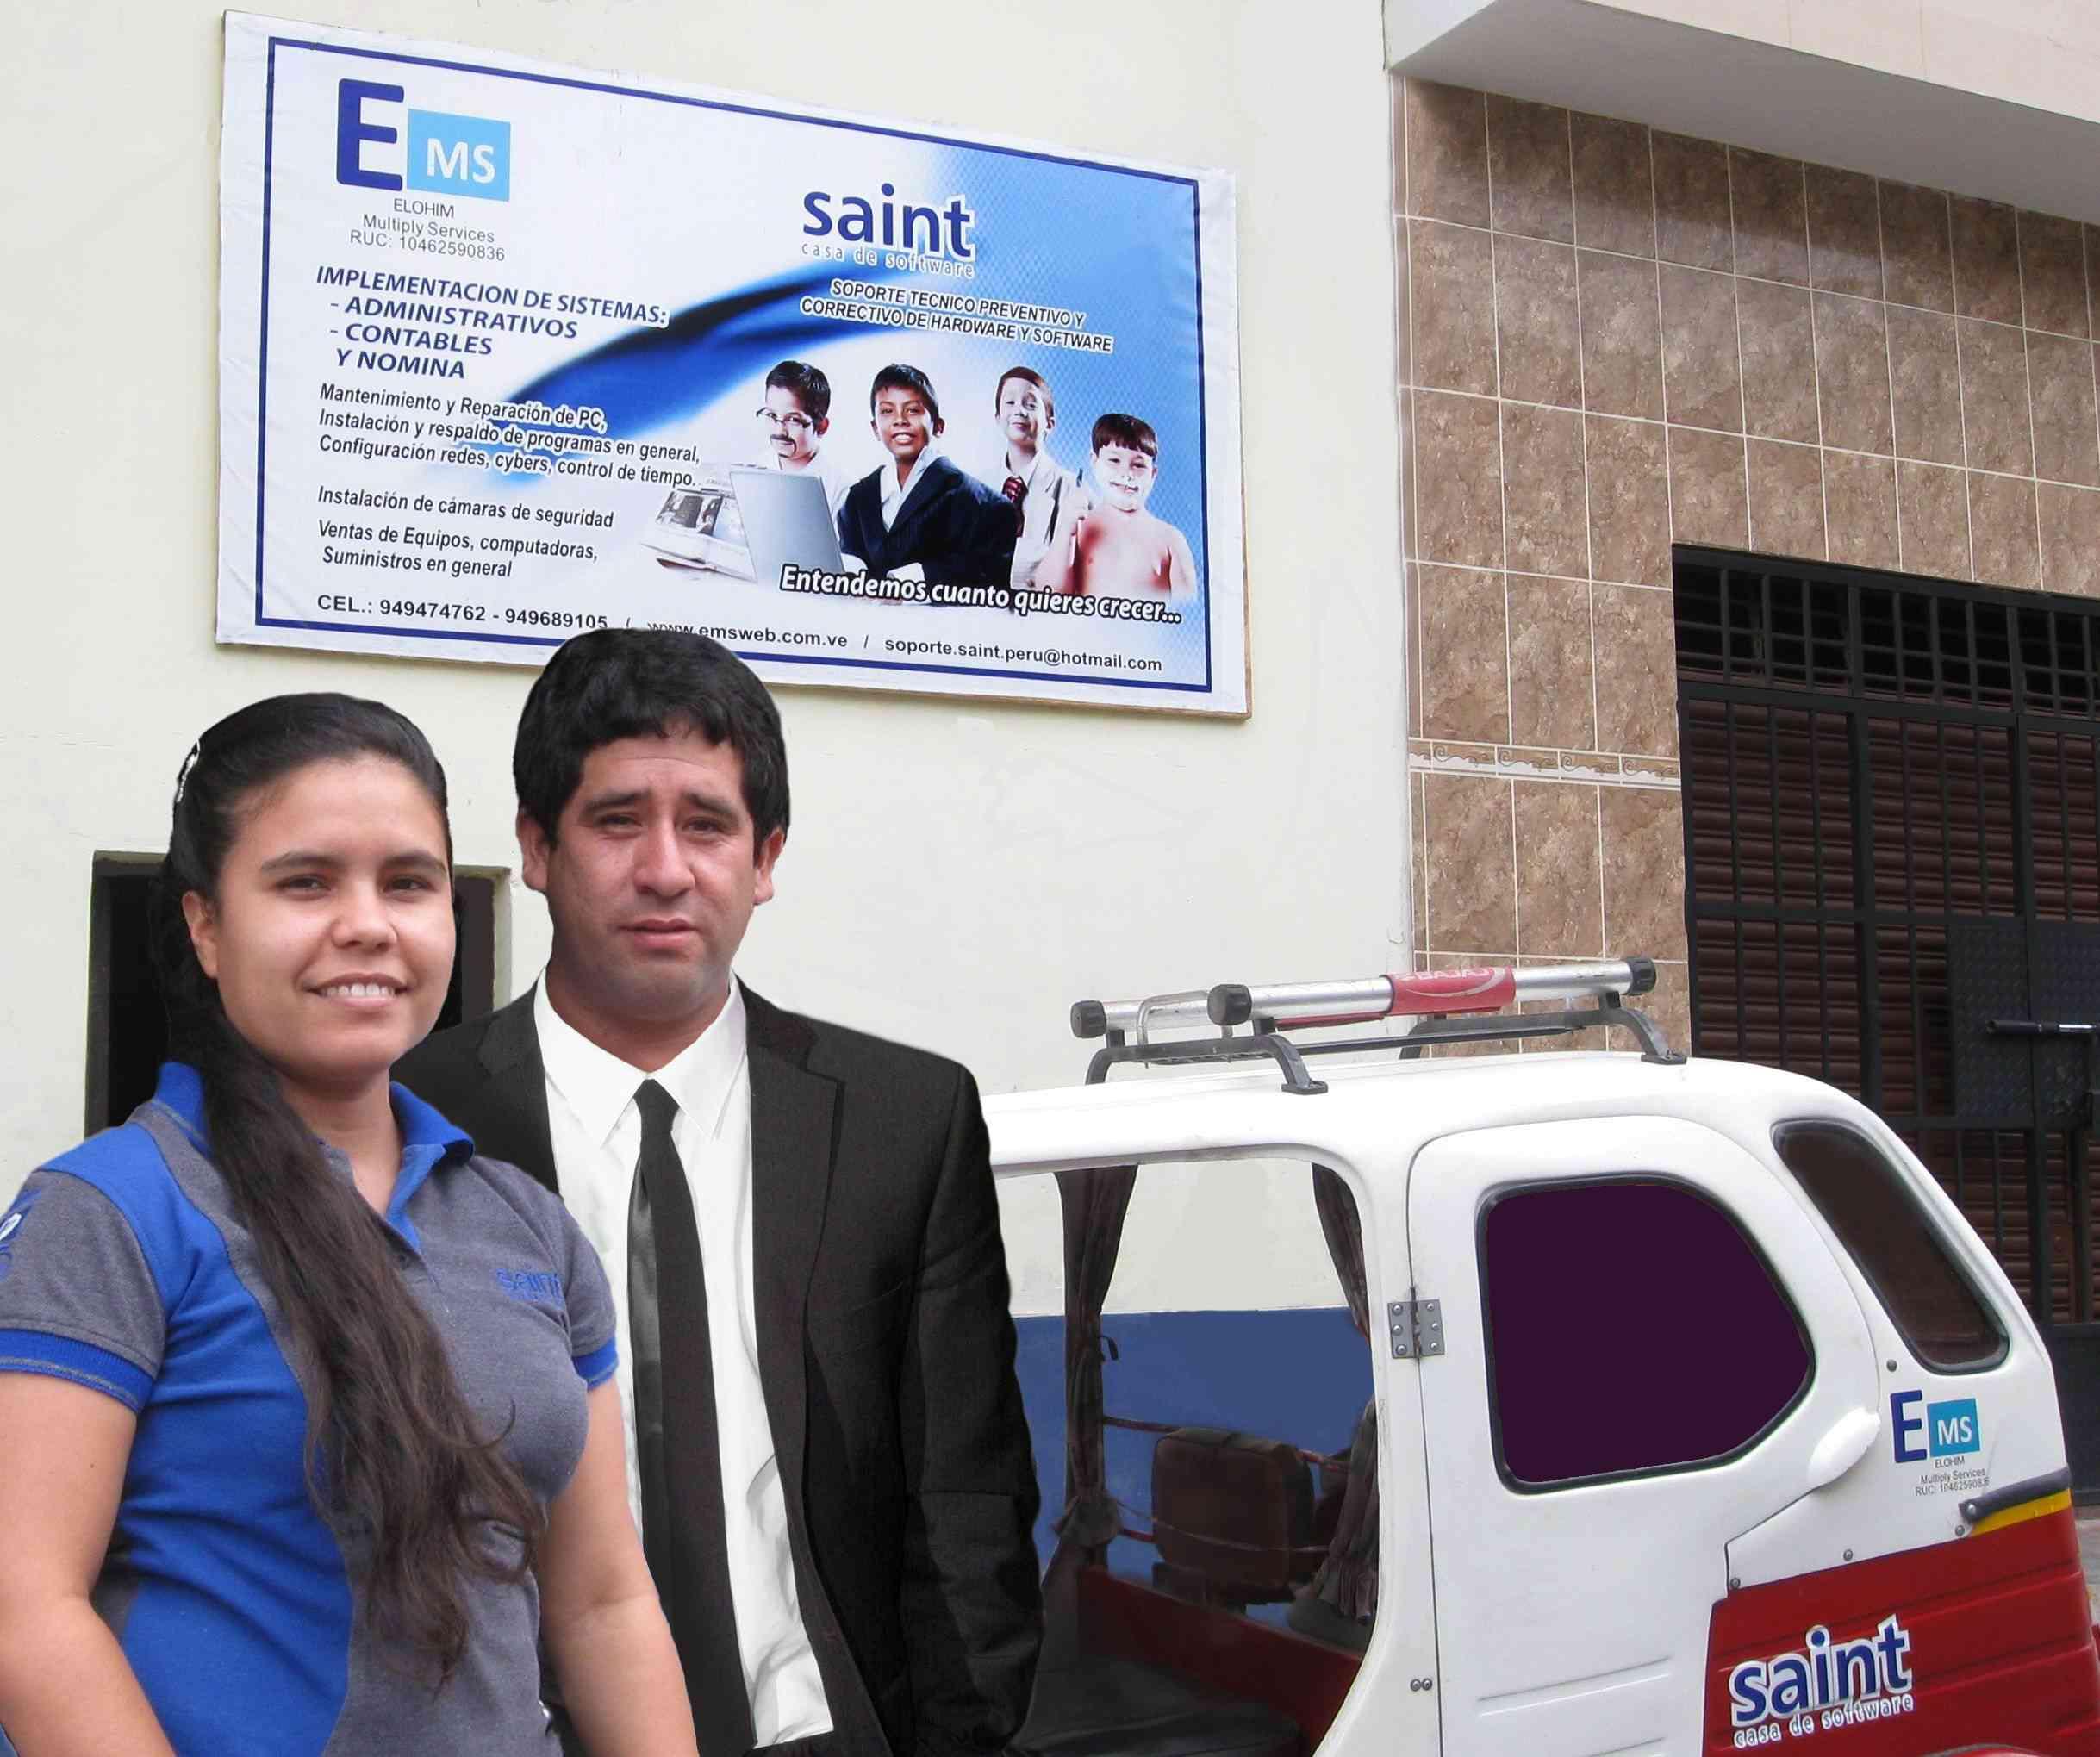 saint crece en Perú